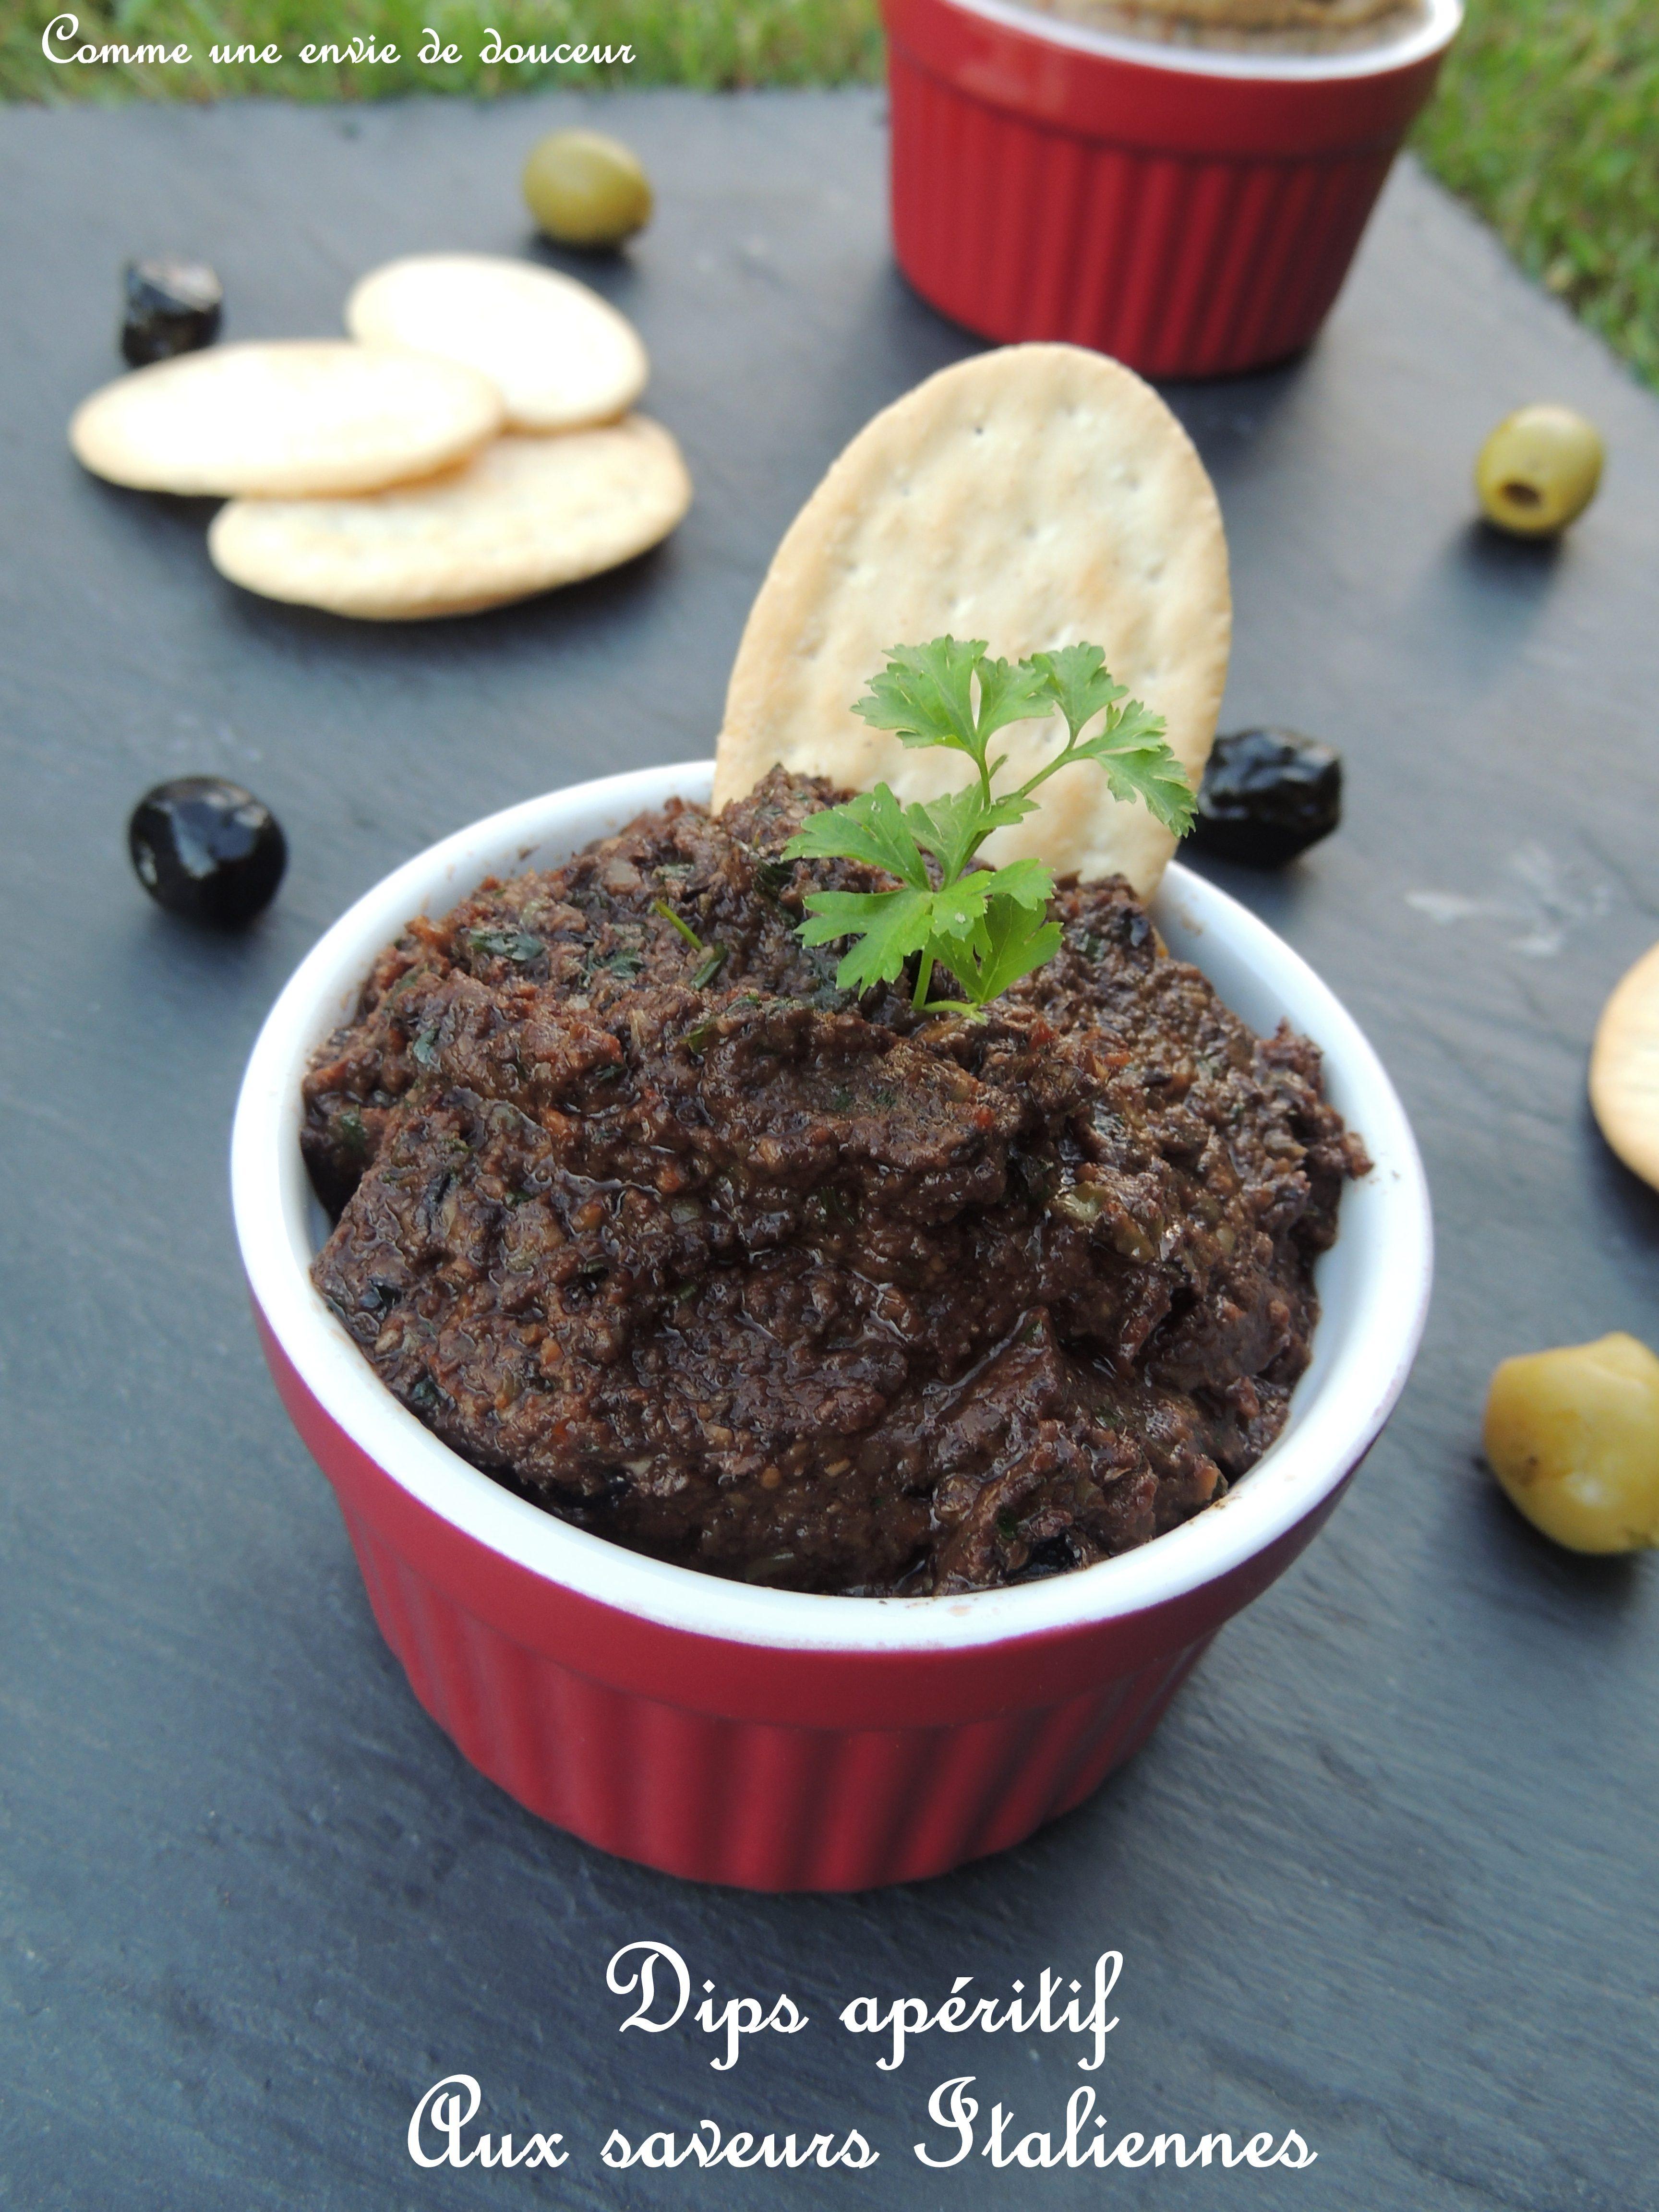 Dips apéritifs aux saveur Italiennes - Aperitif dip's, Italian flavors